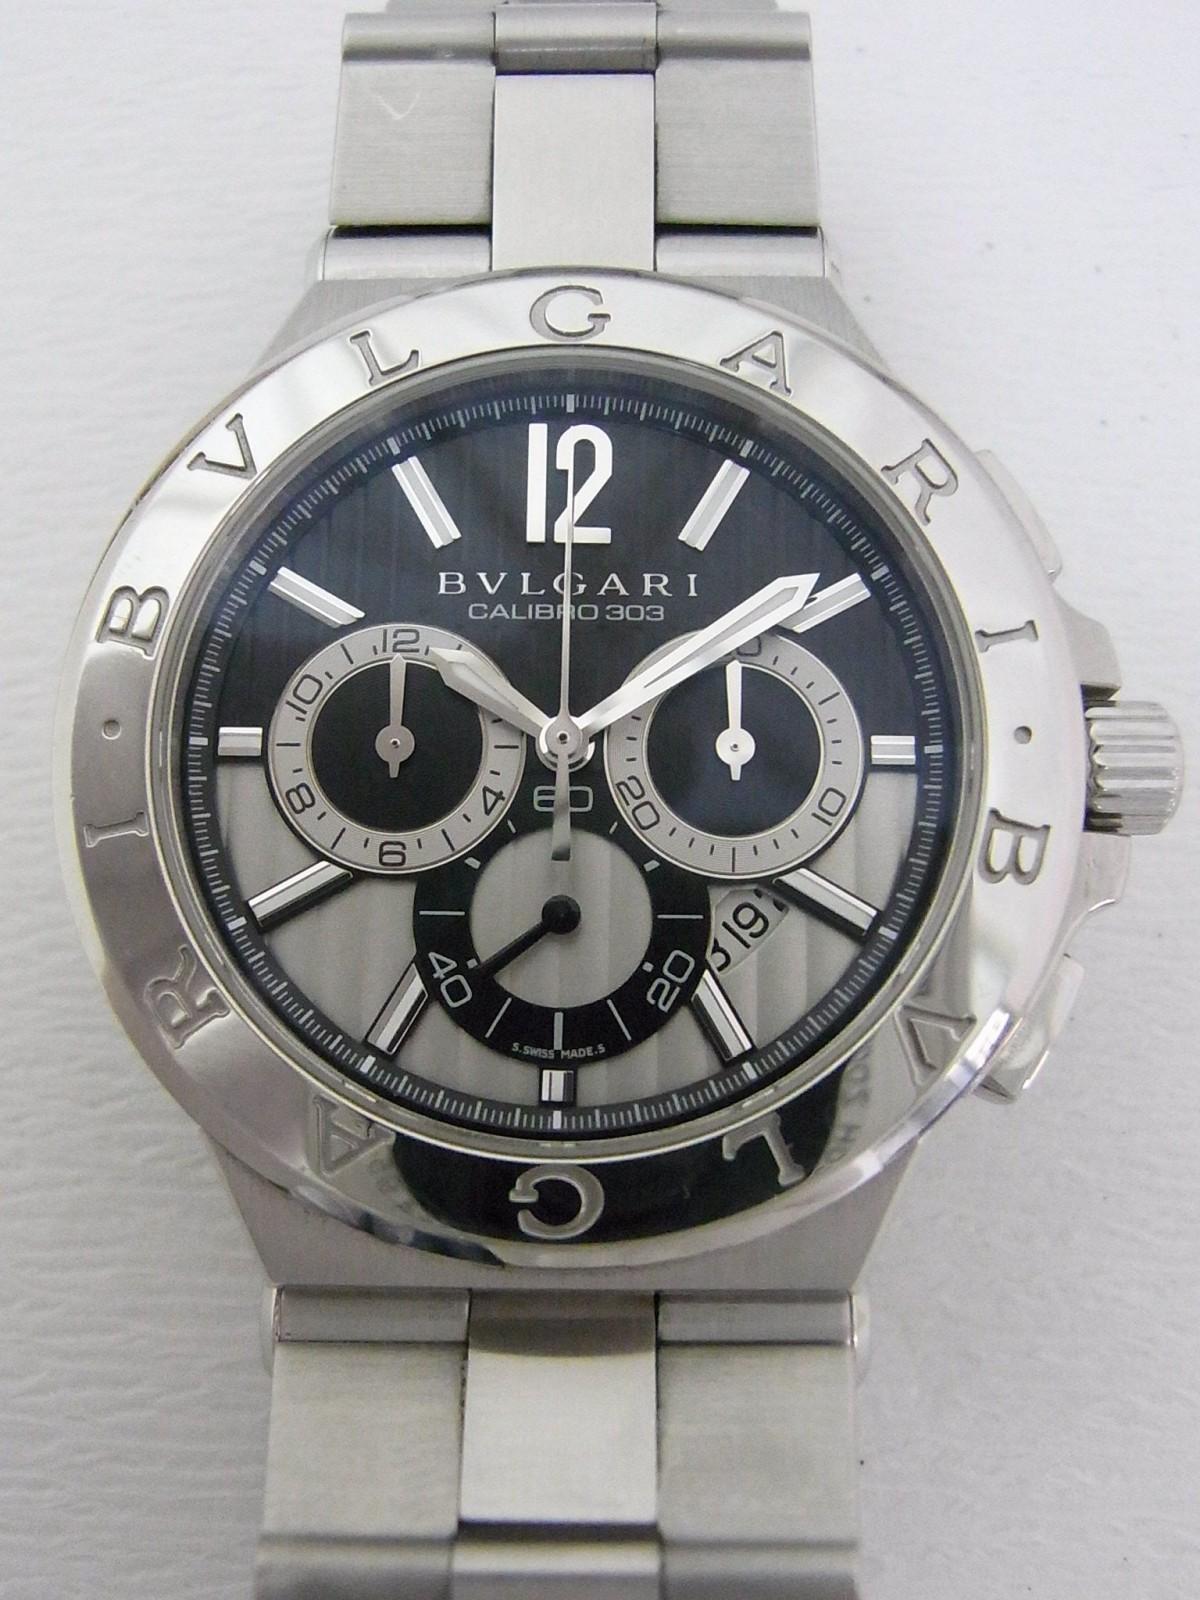 f236d2c6439 Bvlgari diagono calibro 303 DG42SCH (Pre-owned watch) 15807